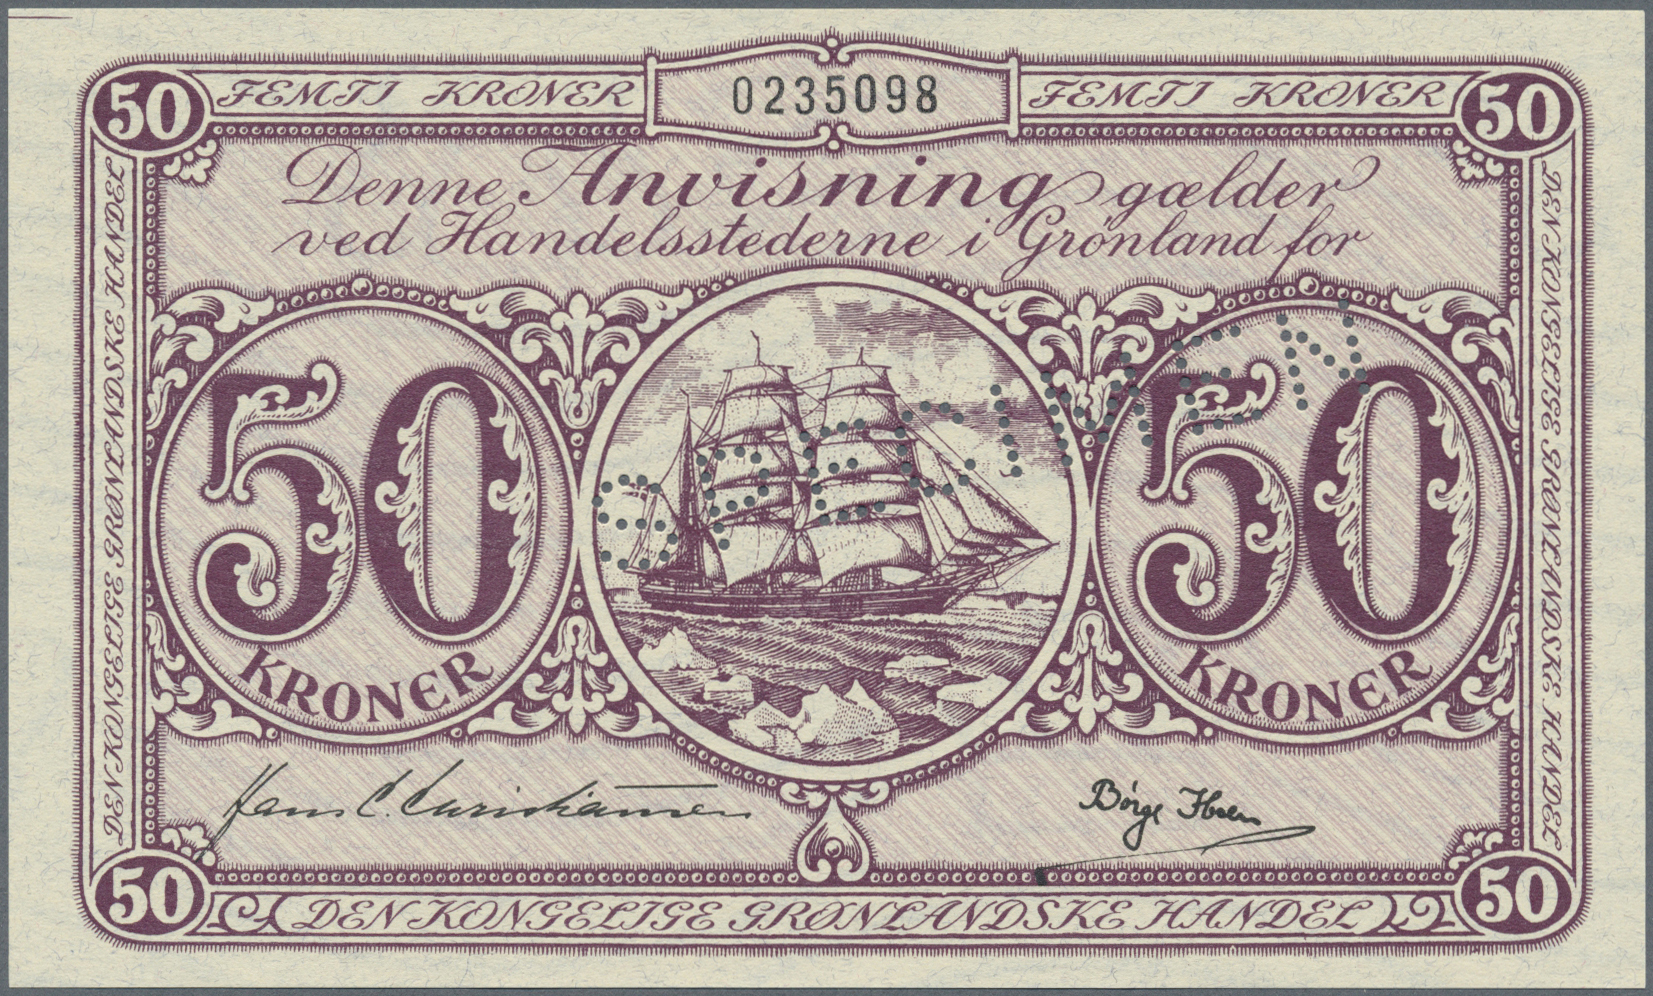 handel med grønland